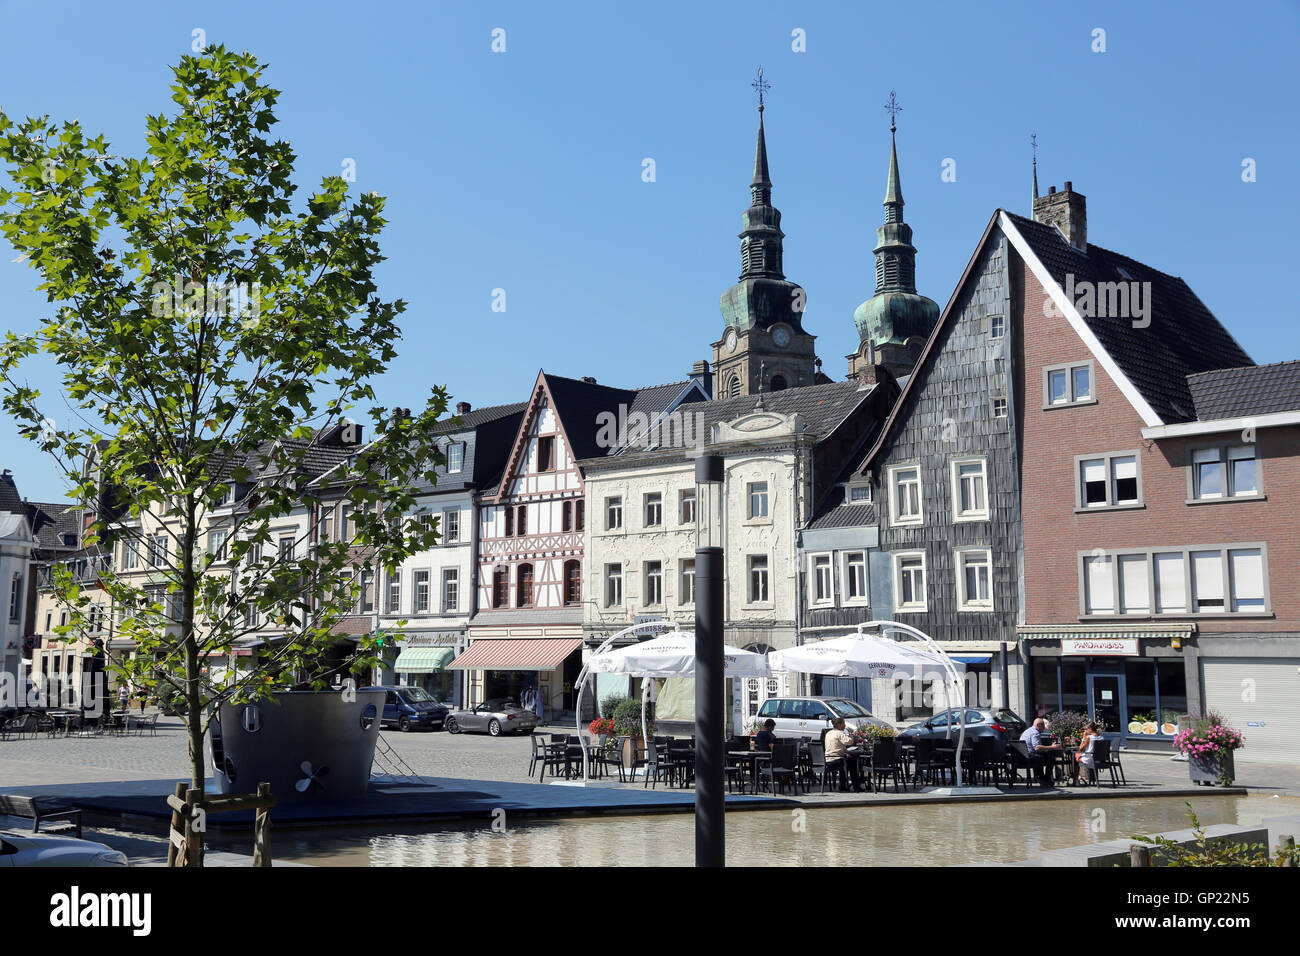 Old Town of Eupen/Belgium with Catholic St. Nicholas Church. Capital of the German-speaking Community in Belgium. Stock Photo